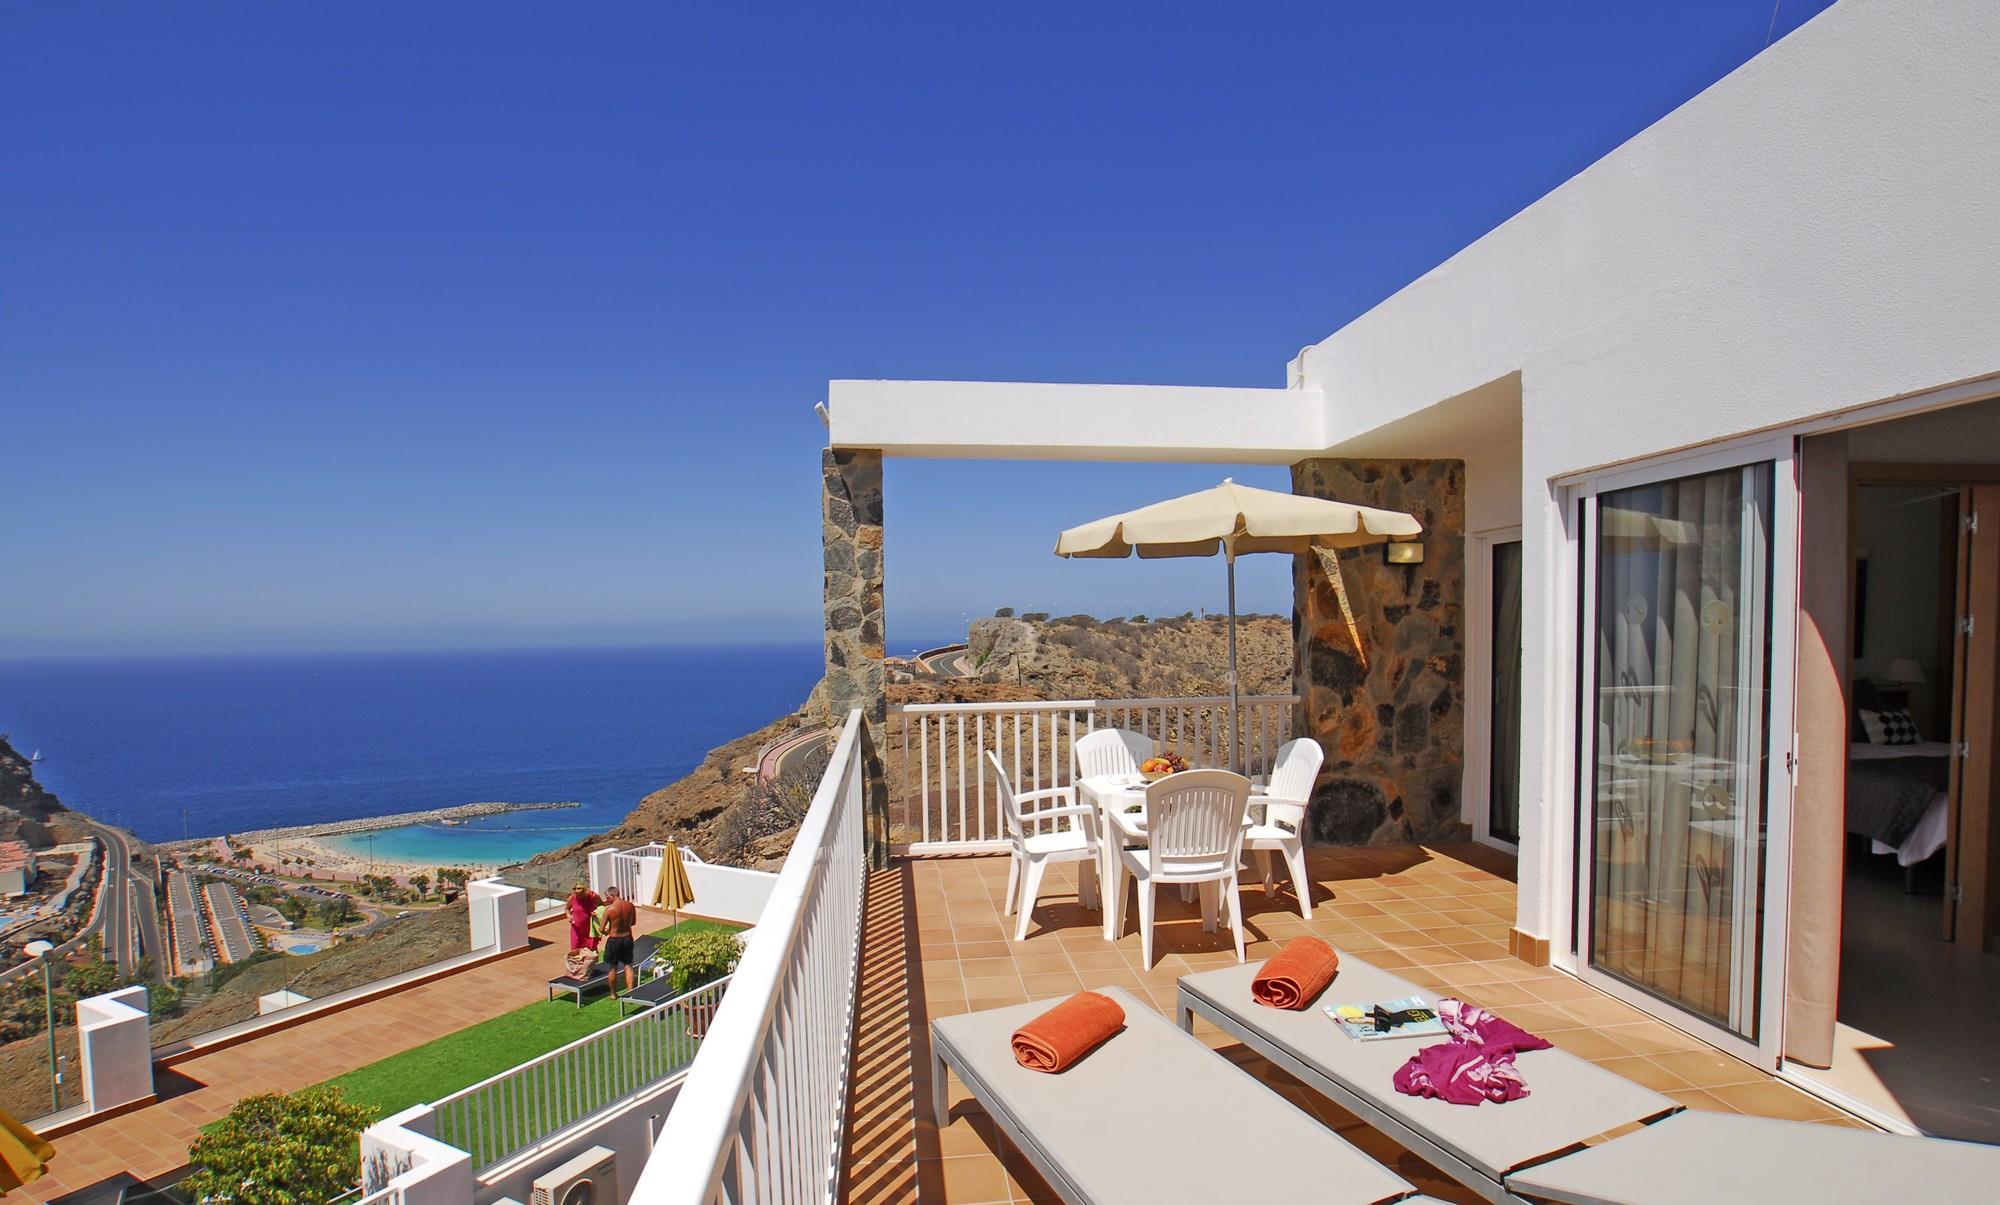 Cheap Hotels In Puerto Rico Gran Canaria